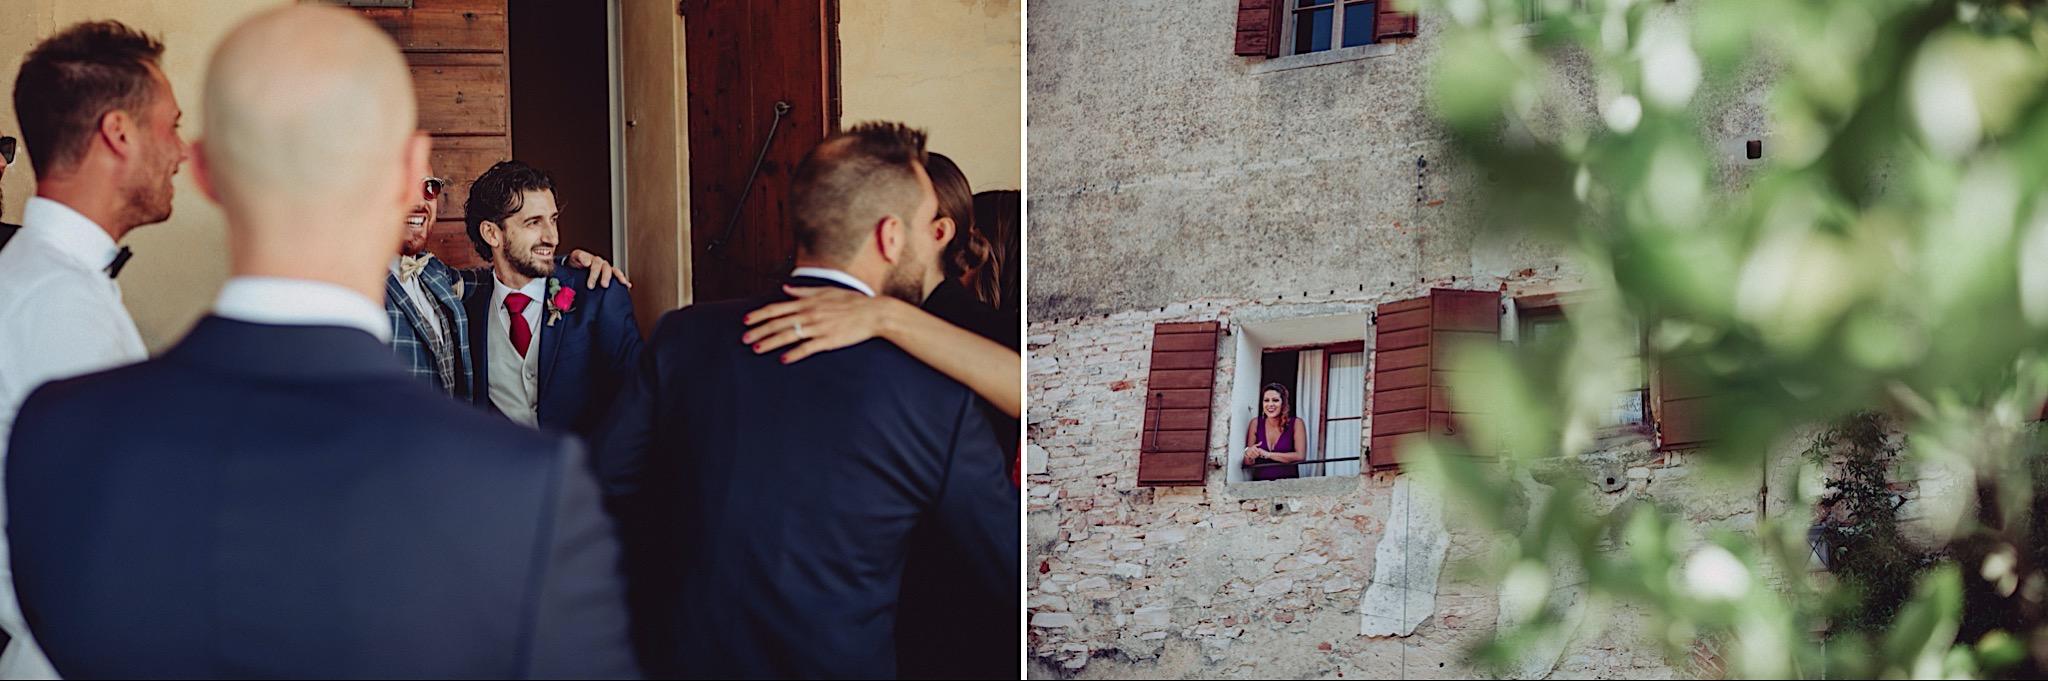 fotografo-matrimonio-villa-papafava-frassanelle-13